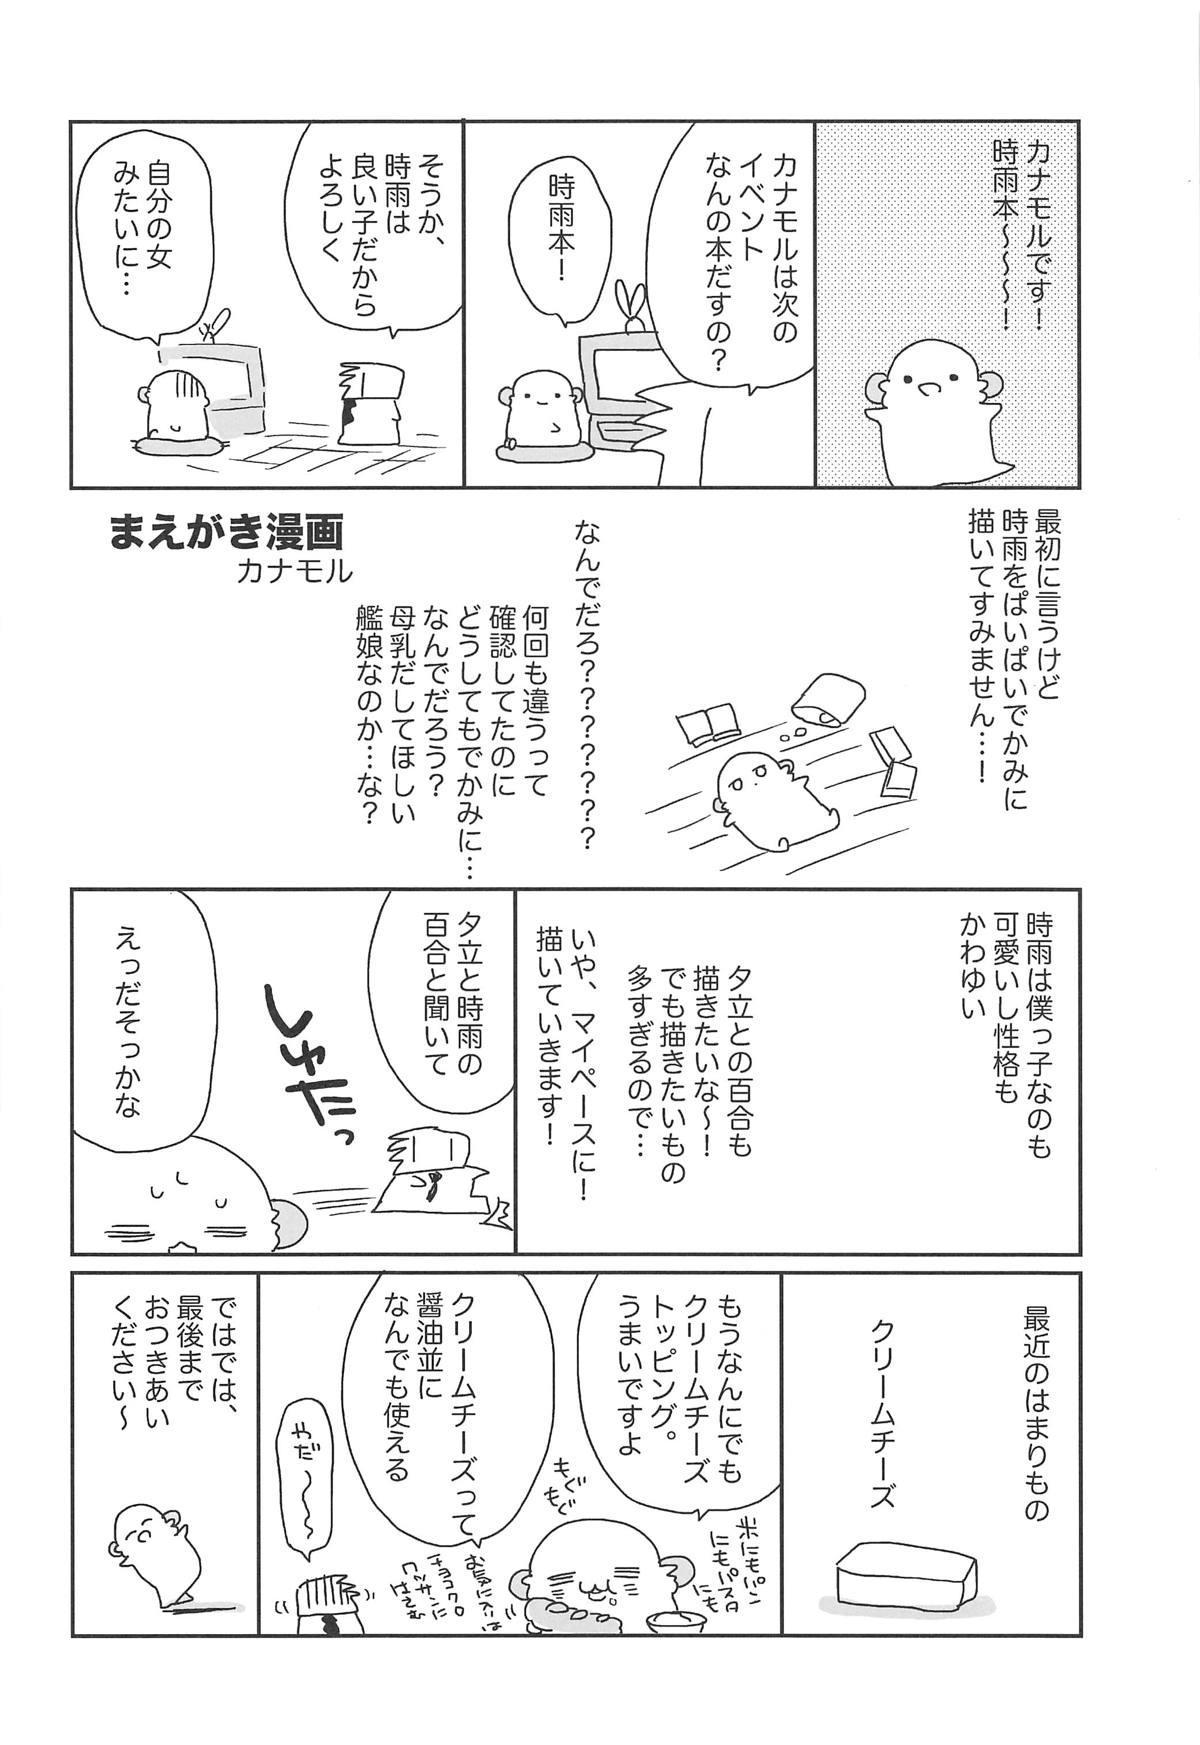 Kawaii Koibito 2